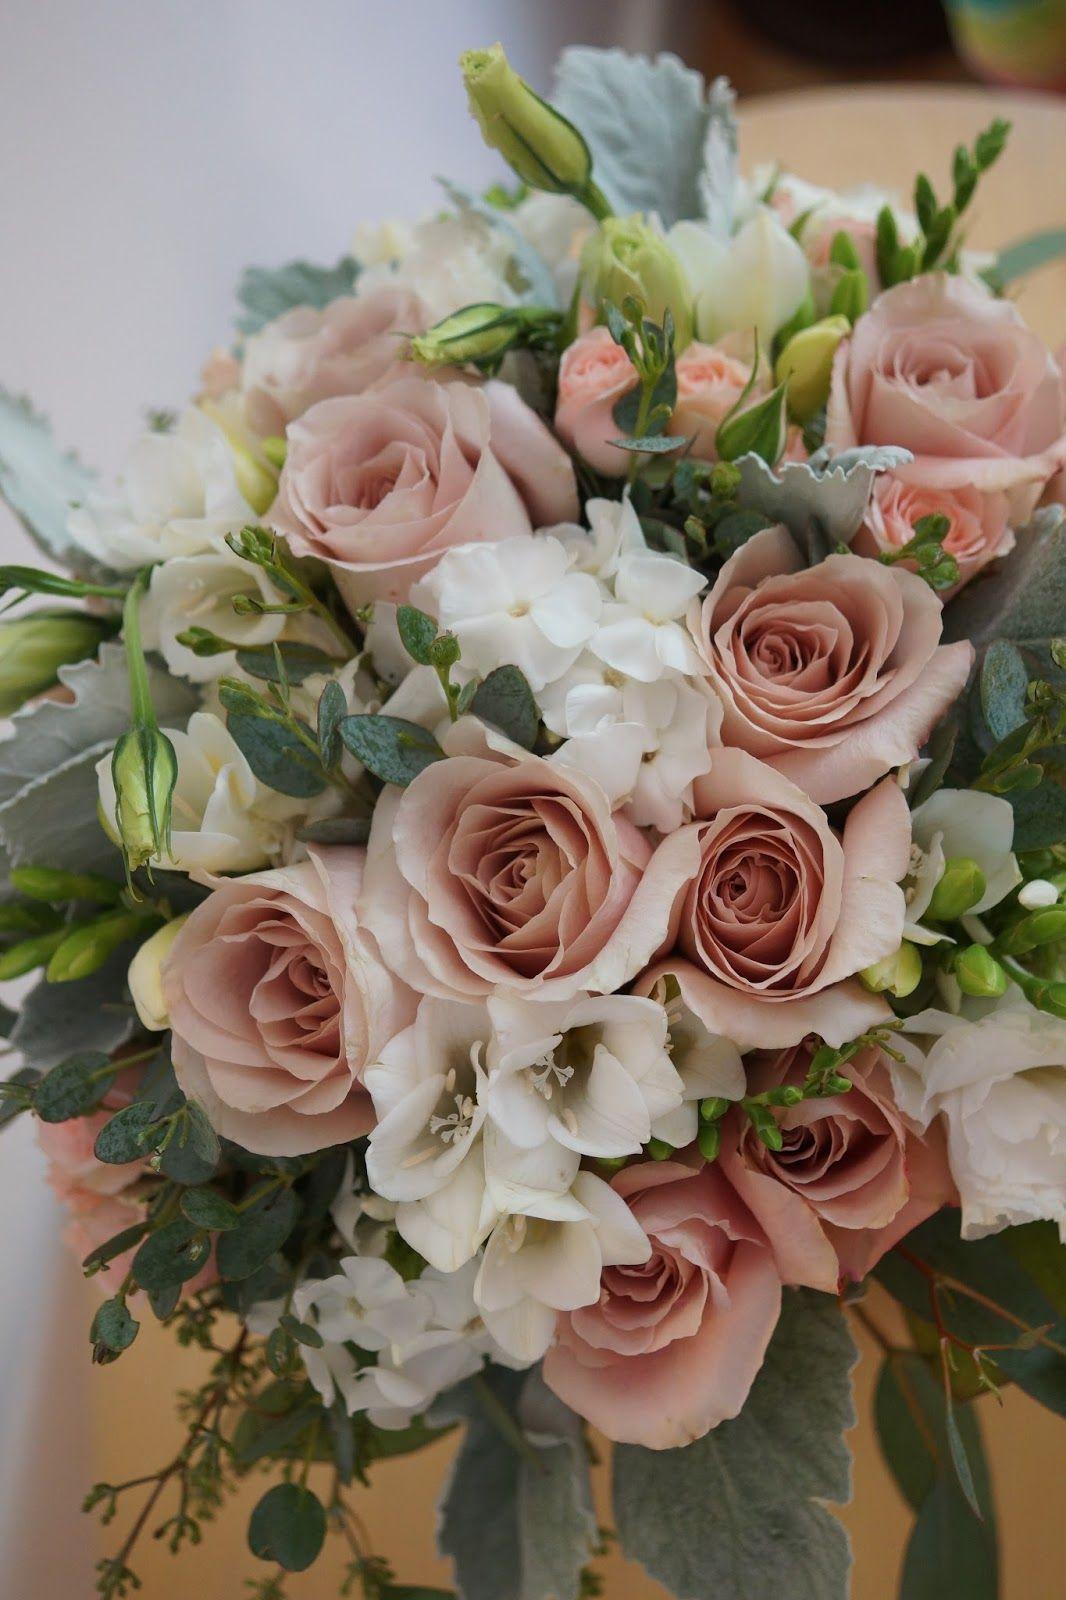 07 17 15 6734 Jpg 1066 1600 Flower Arrangements Wedding Flower Arrangements Bridal Flowers